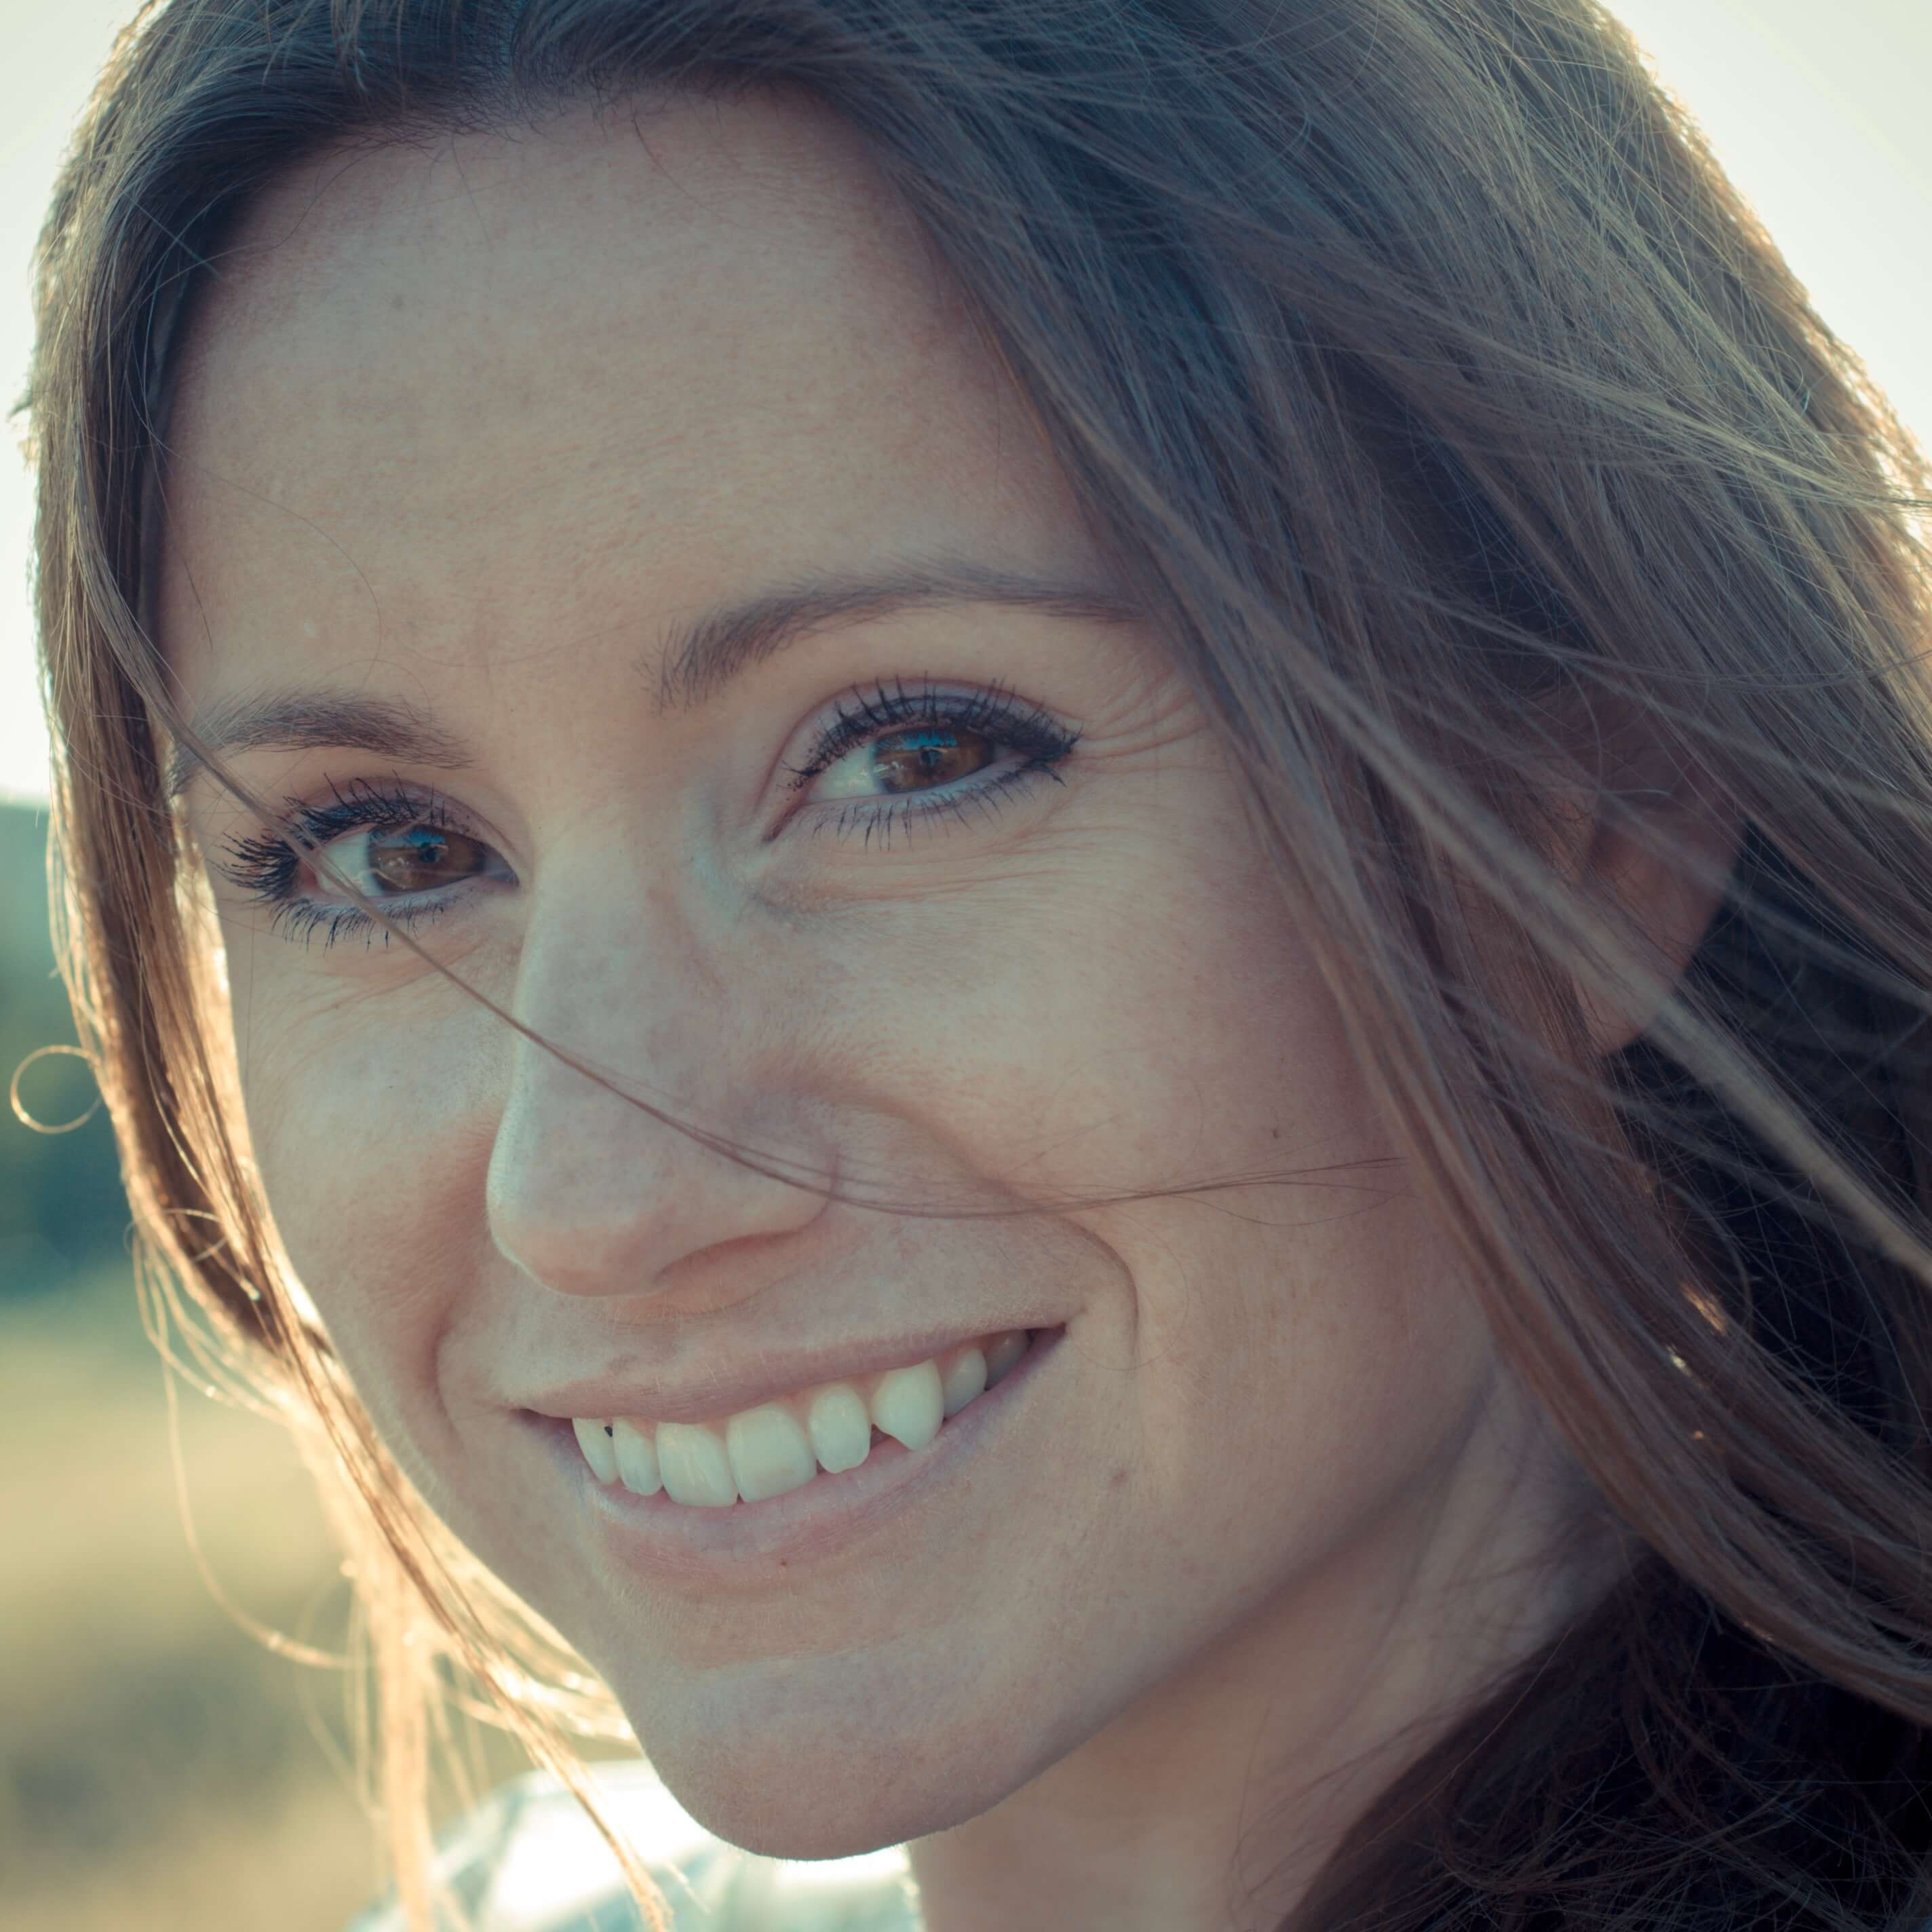 Denise Funfar